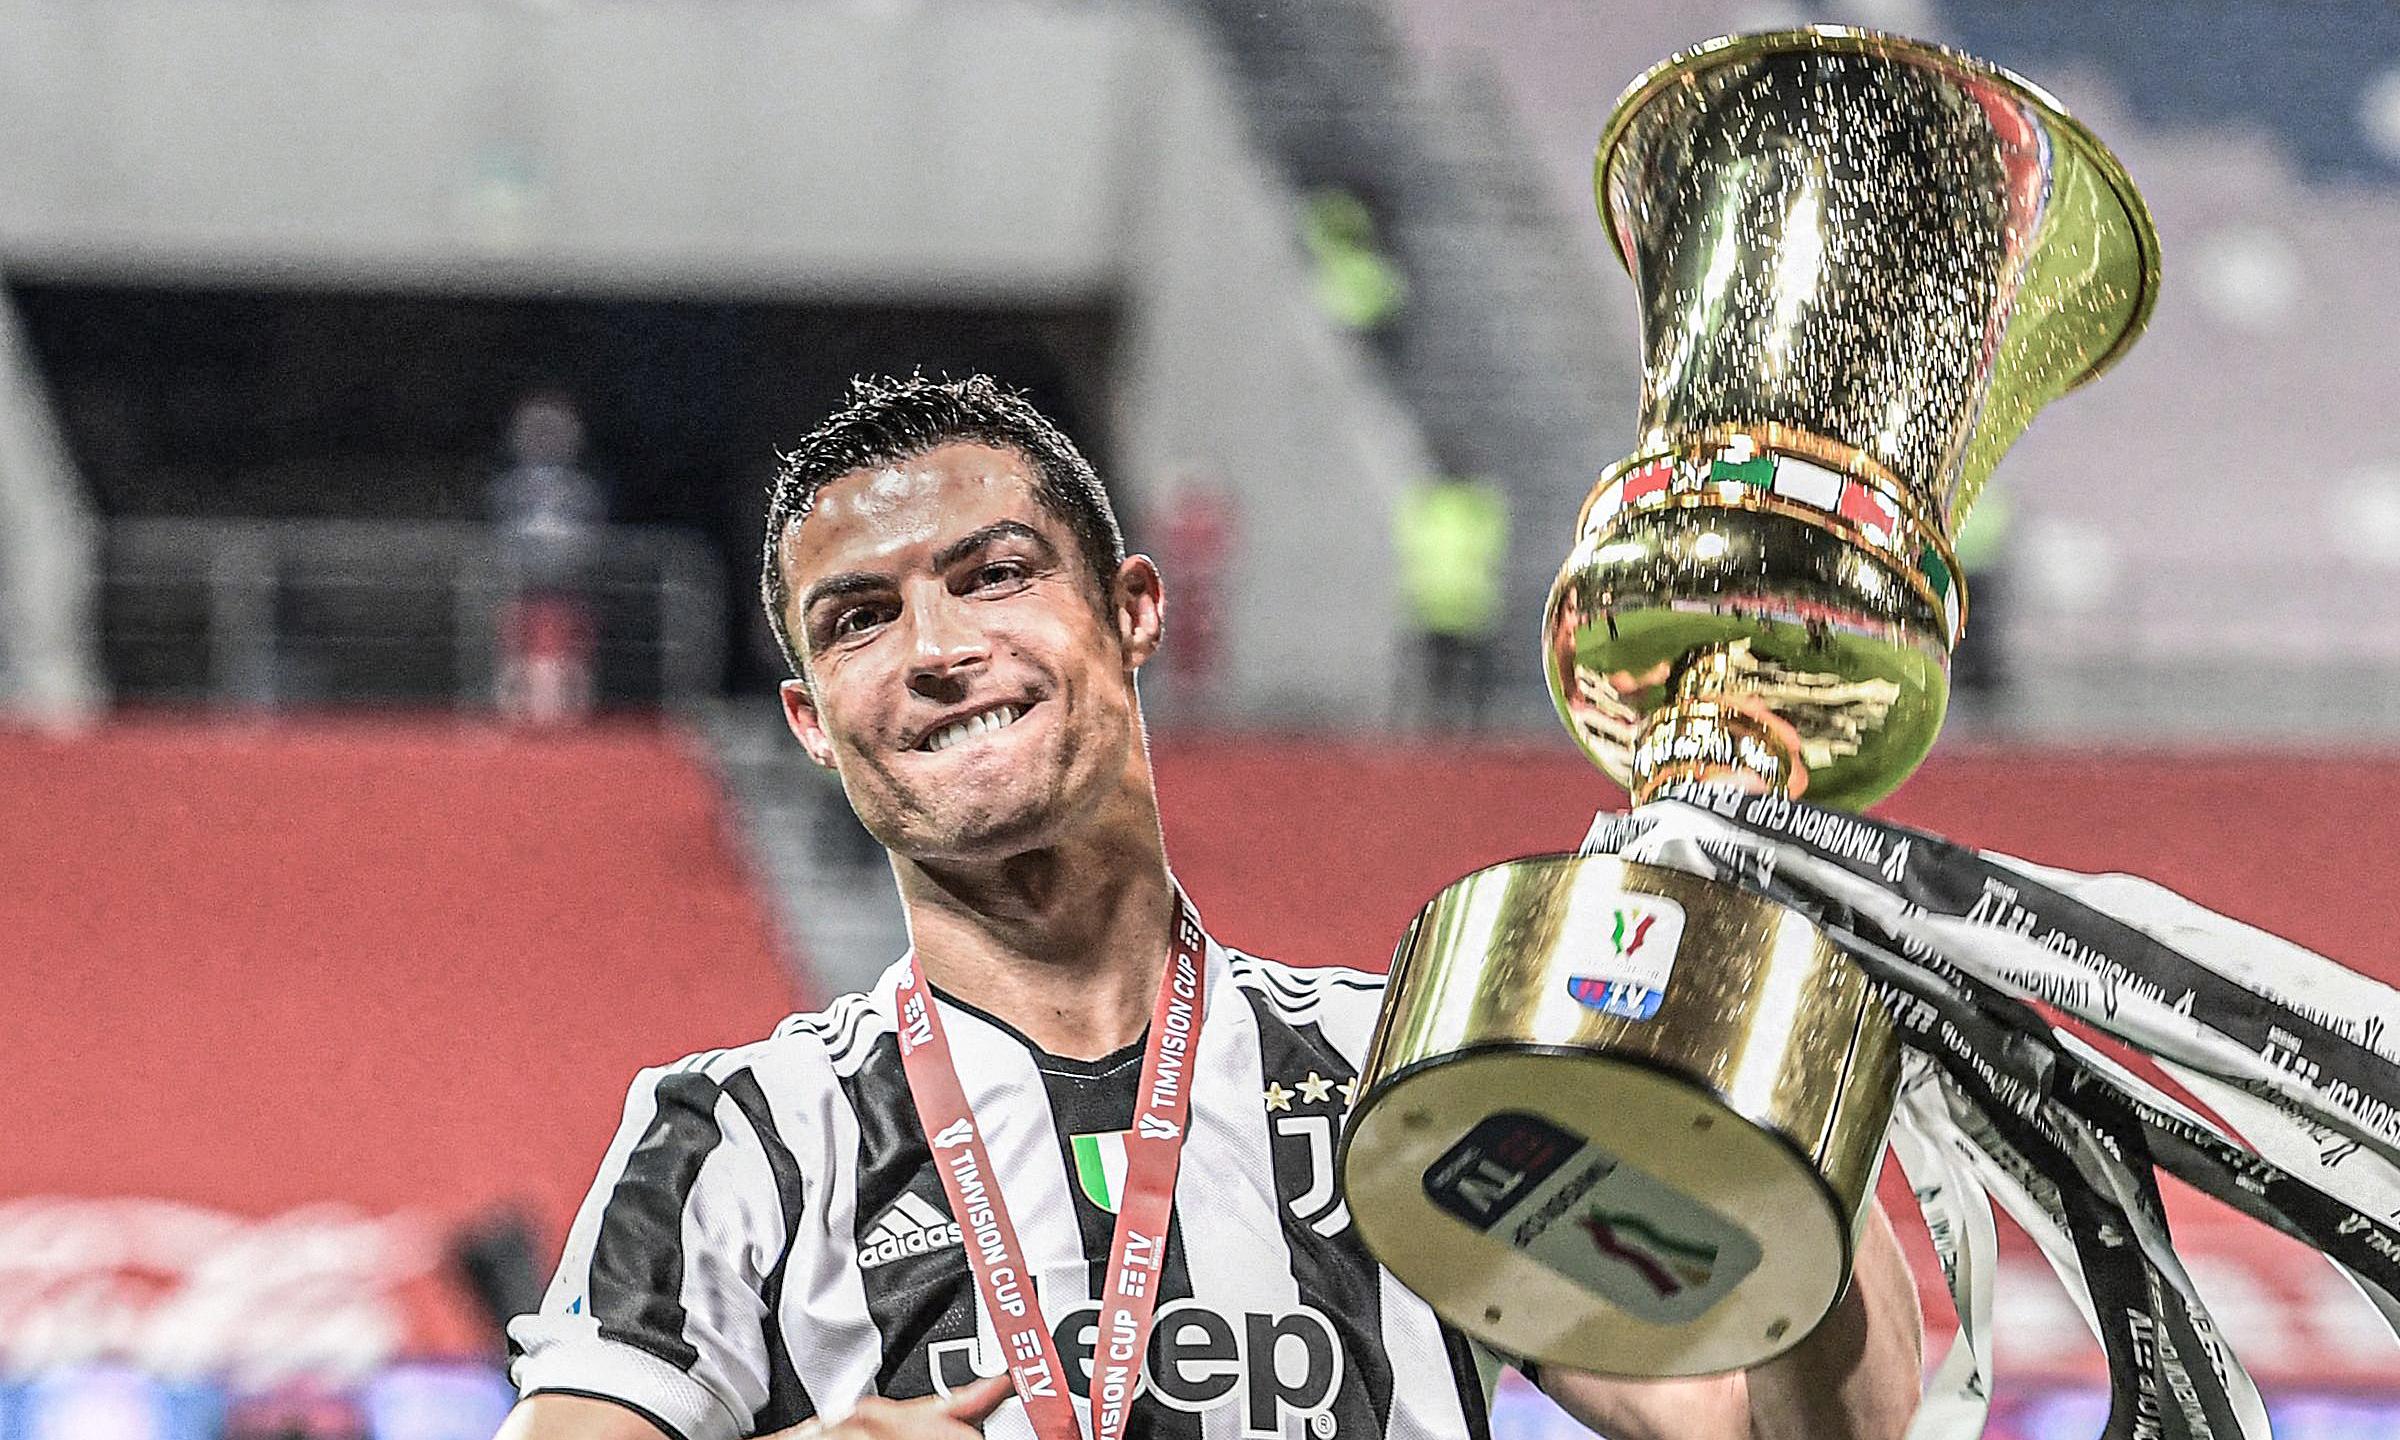 Ronaldo ฉลองถ้วยอิตาลีที่ Mapei Stadium เมื่อวันที่ 19 พฤษภาคม  ภาพ: AFP